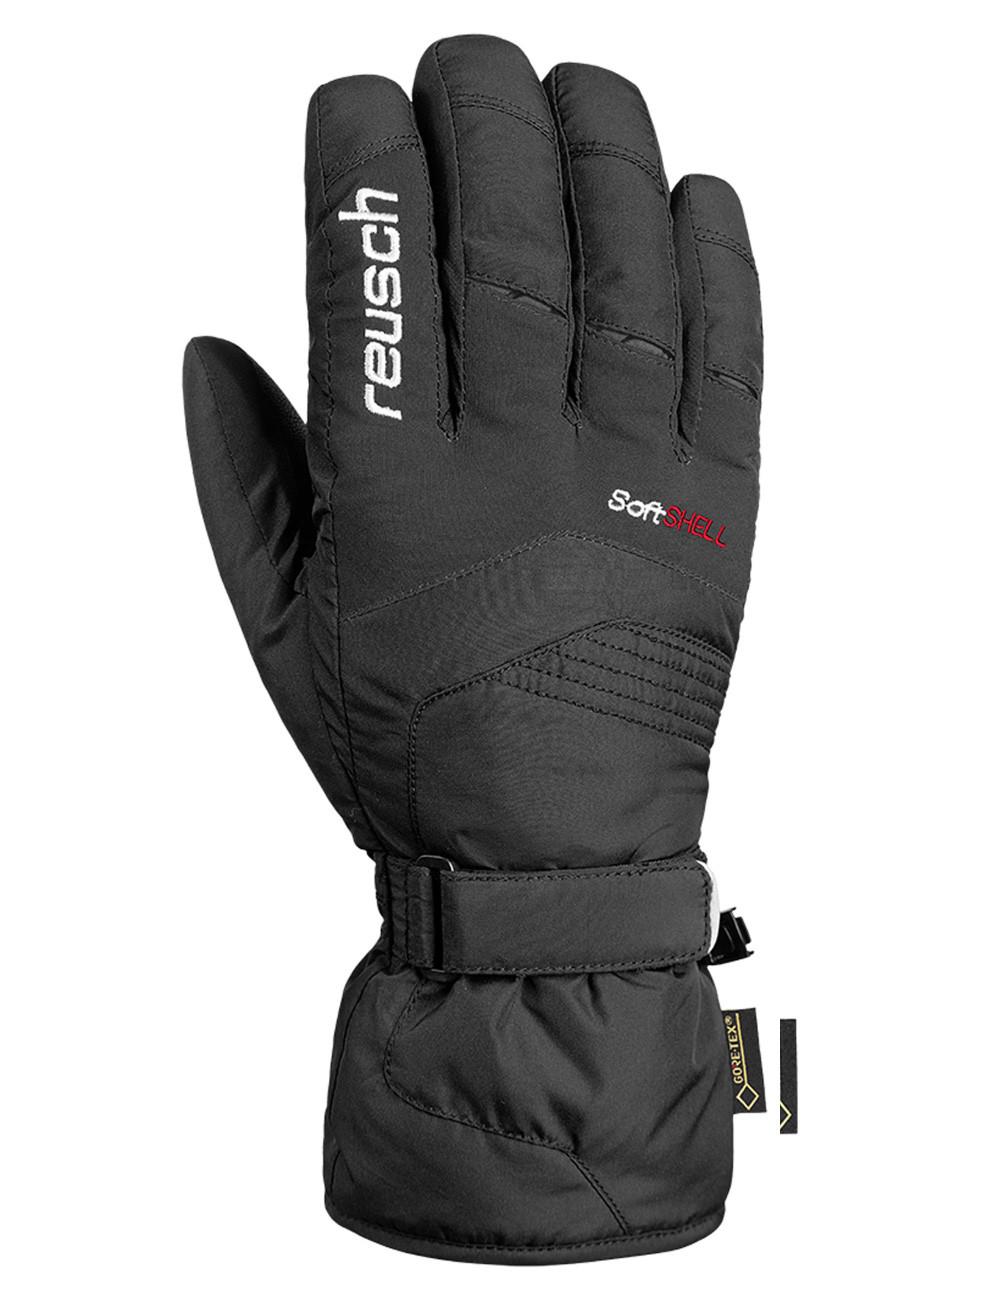 Rękawice narciarskie Reusch Sandor GORE-TEX